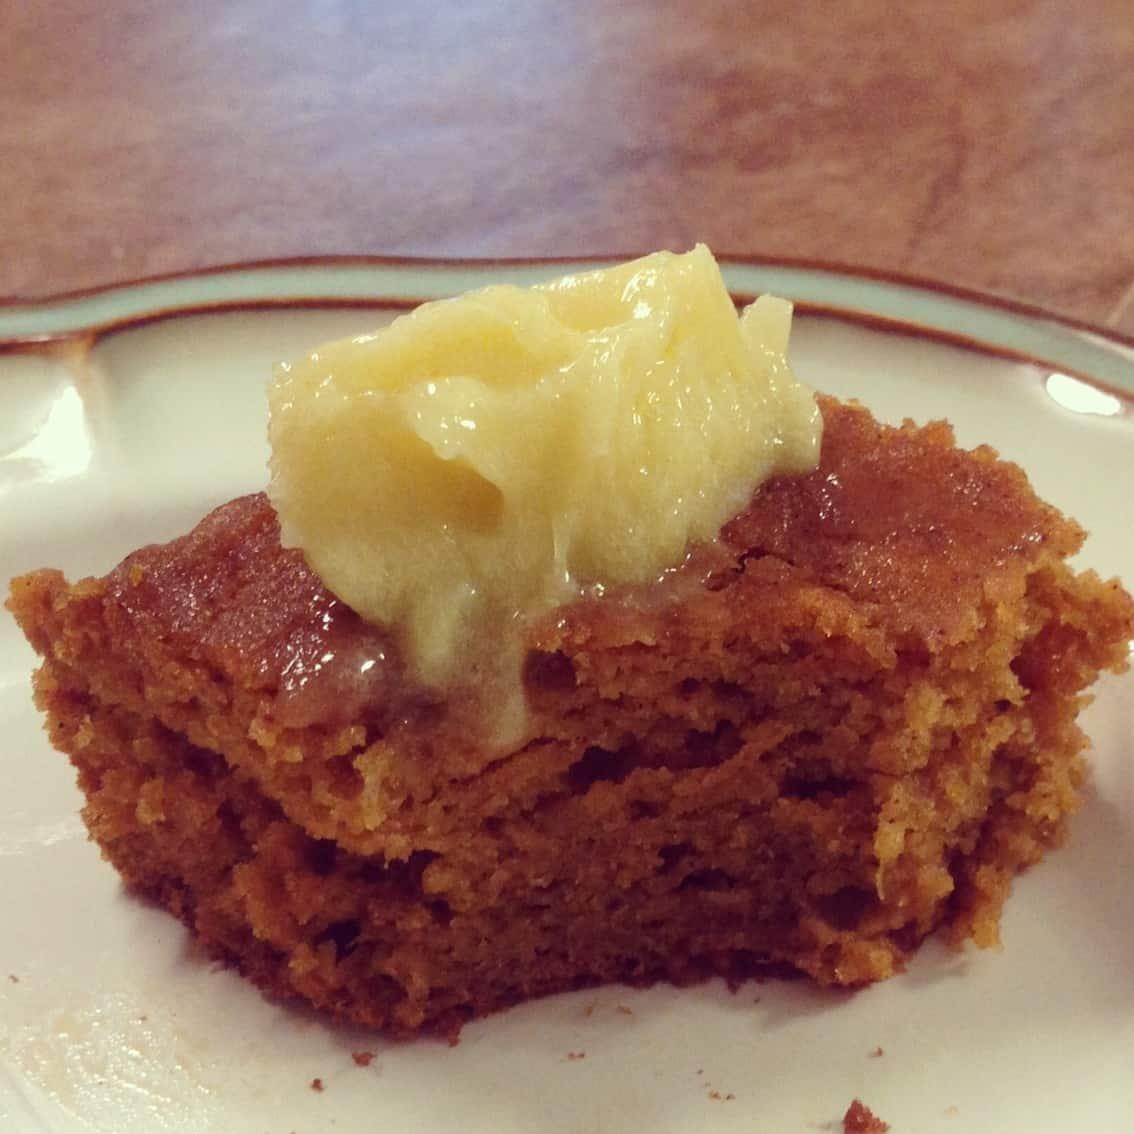 Gluten Free Pumpkin Gingerbread with Lemon Curd